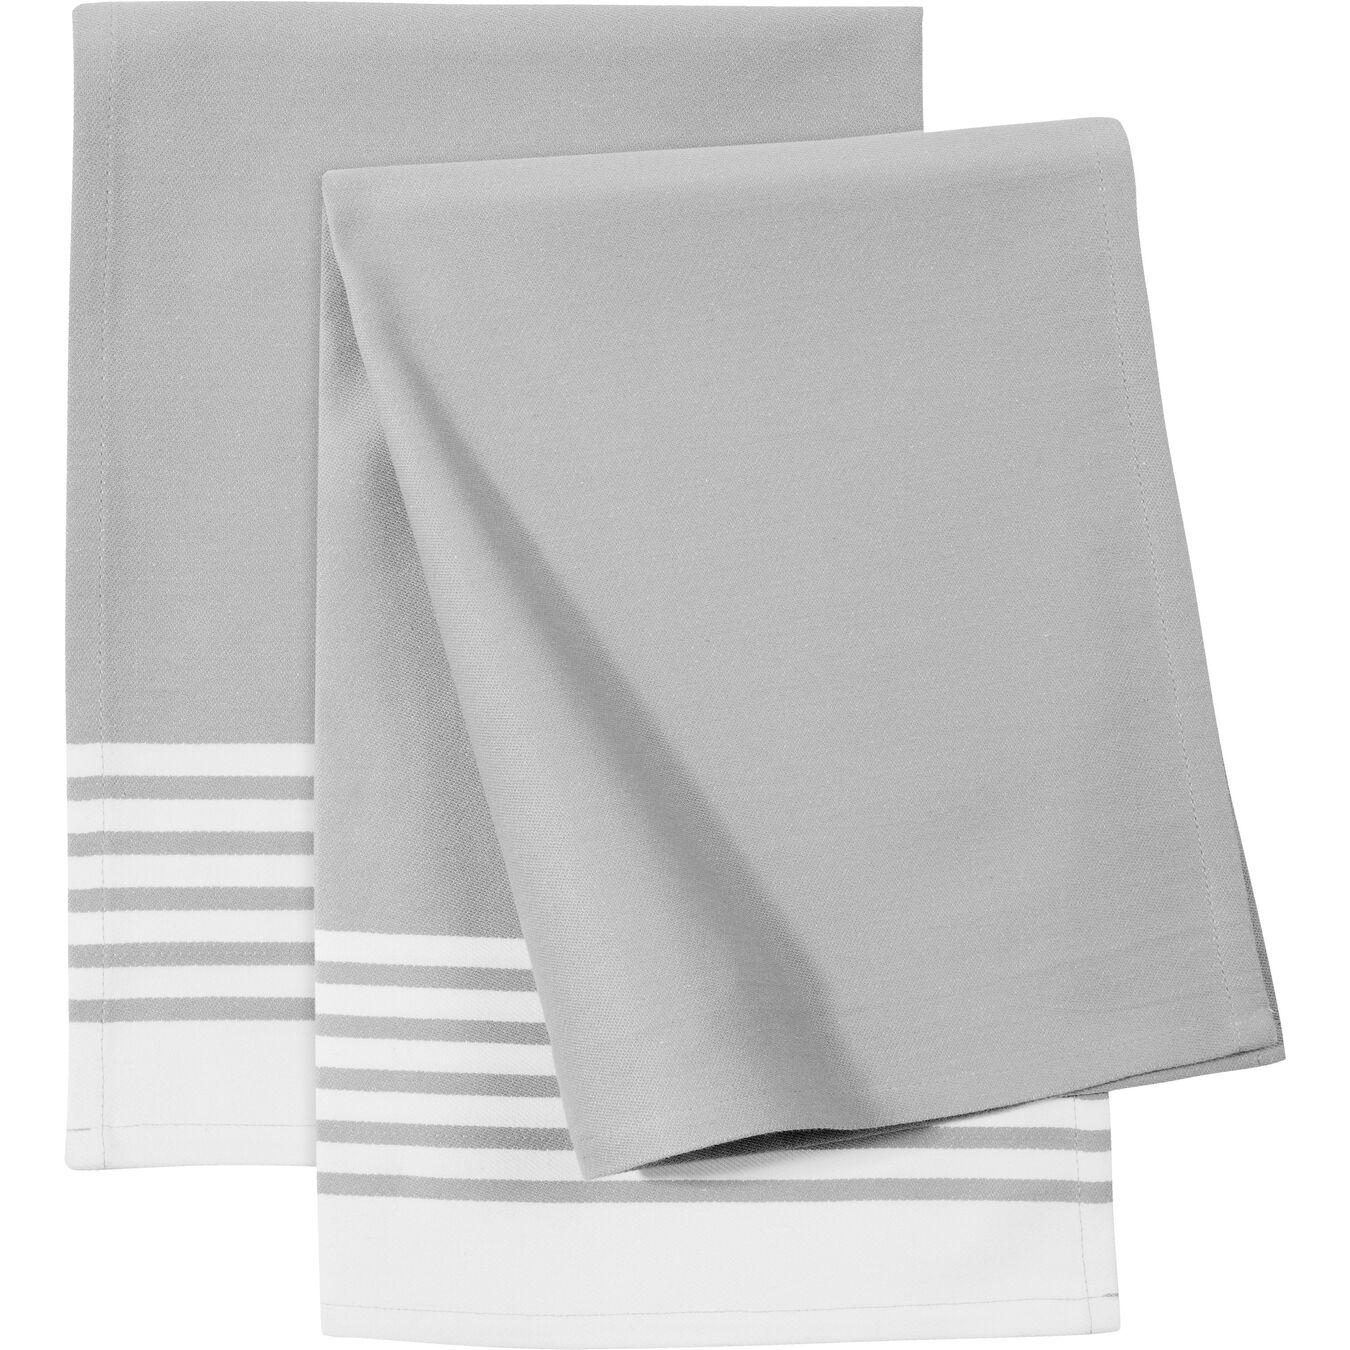 2 Piece Cotton Kitchen towel set striped, Grey,,large 1